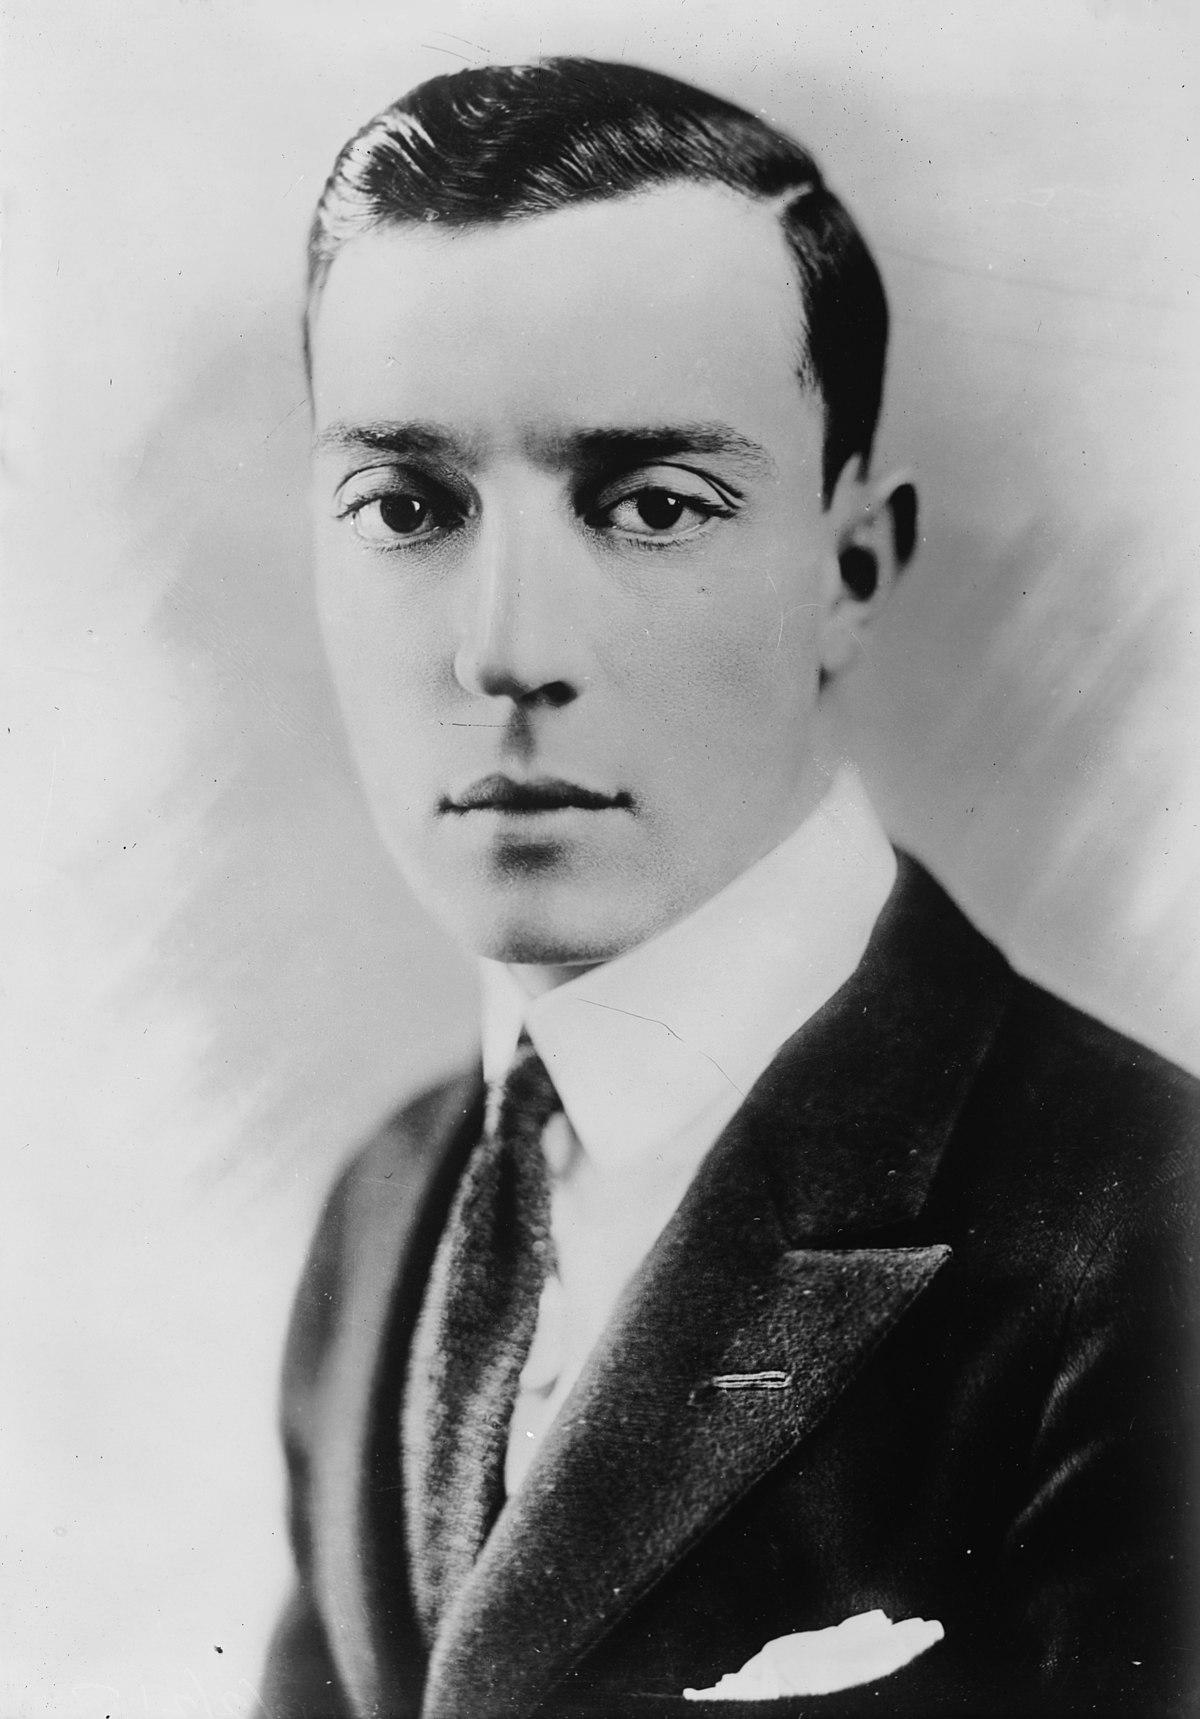 Buster Keaton Wikipedia